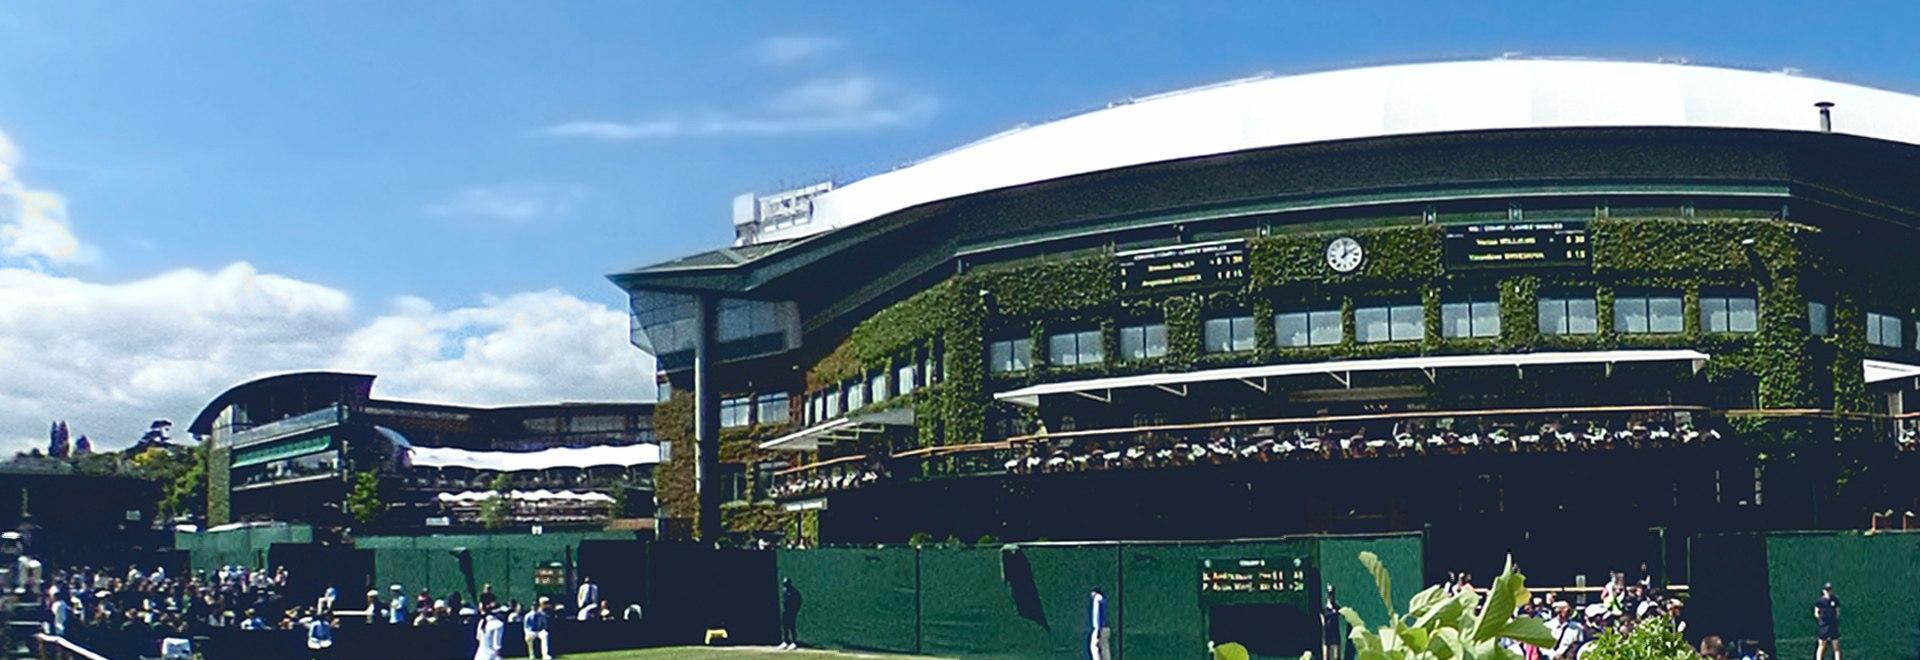 Djokovic - Federer 06/07/14. Finale maschile